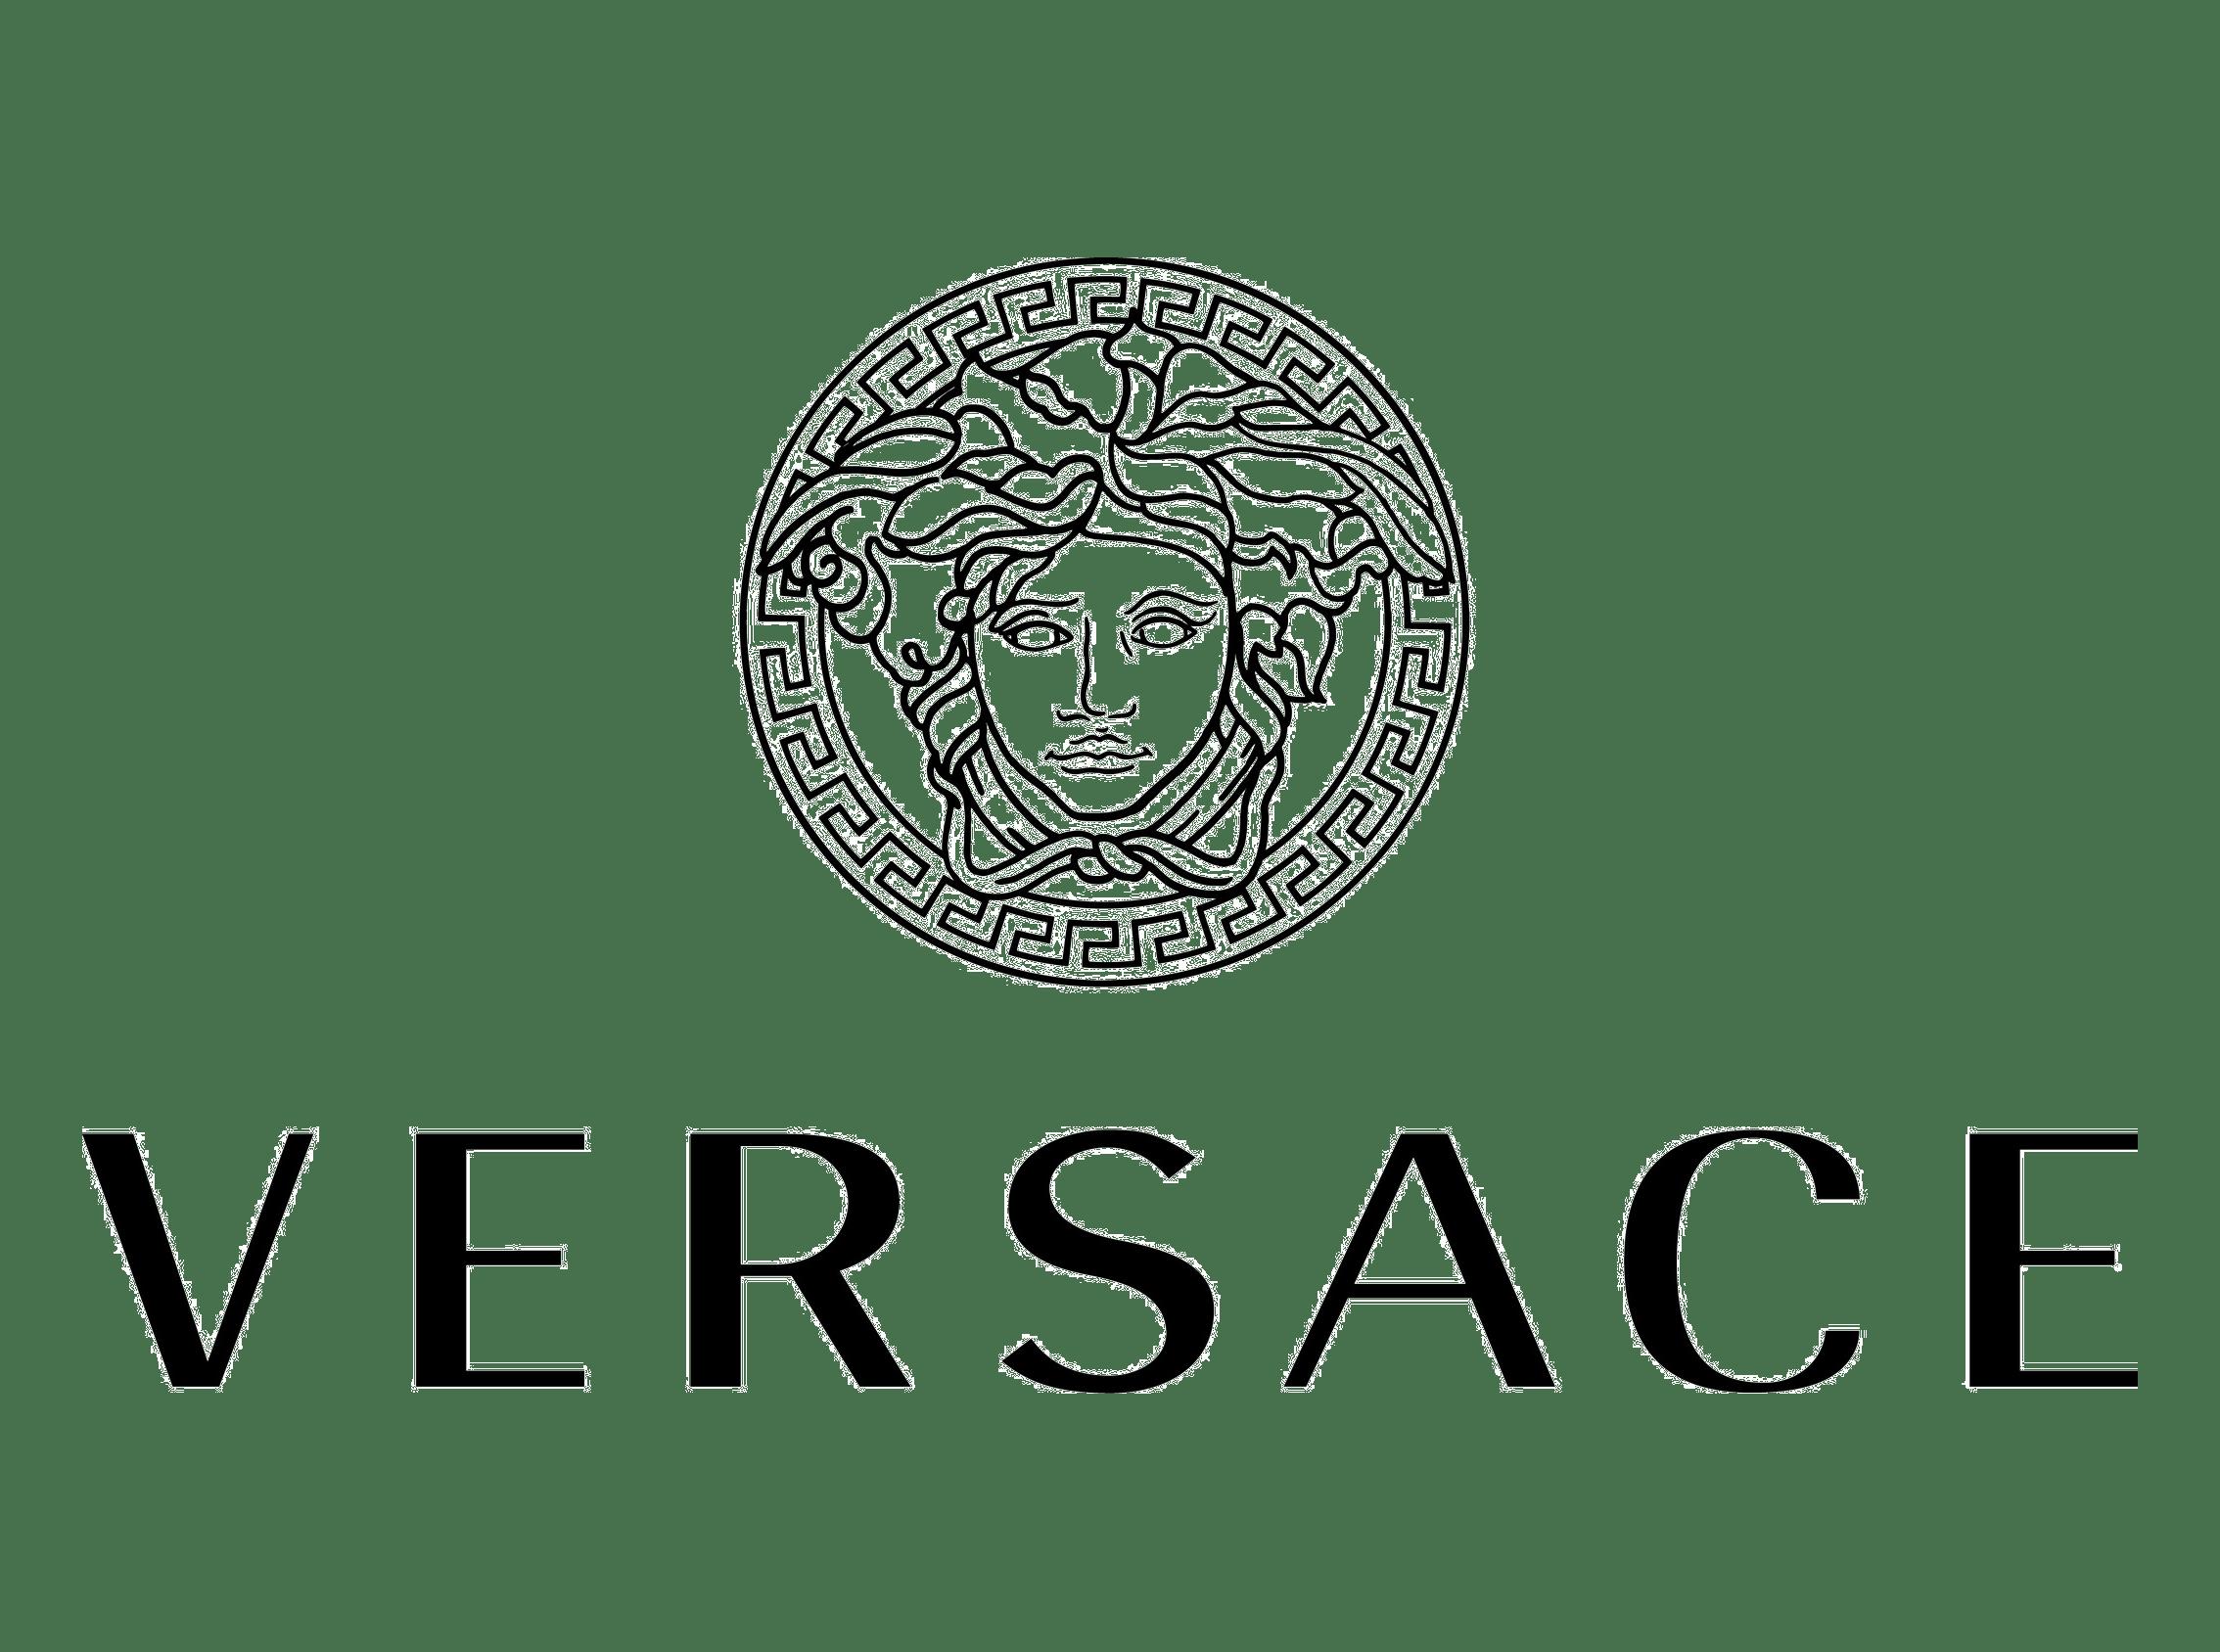 Versace Logo Wallpapers Top Free Versace Logo Backgrounds